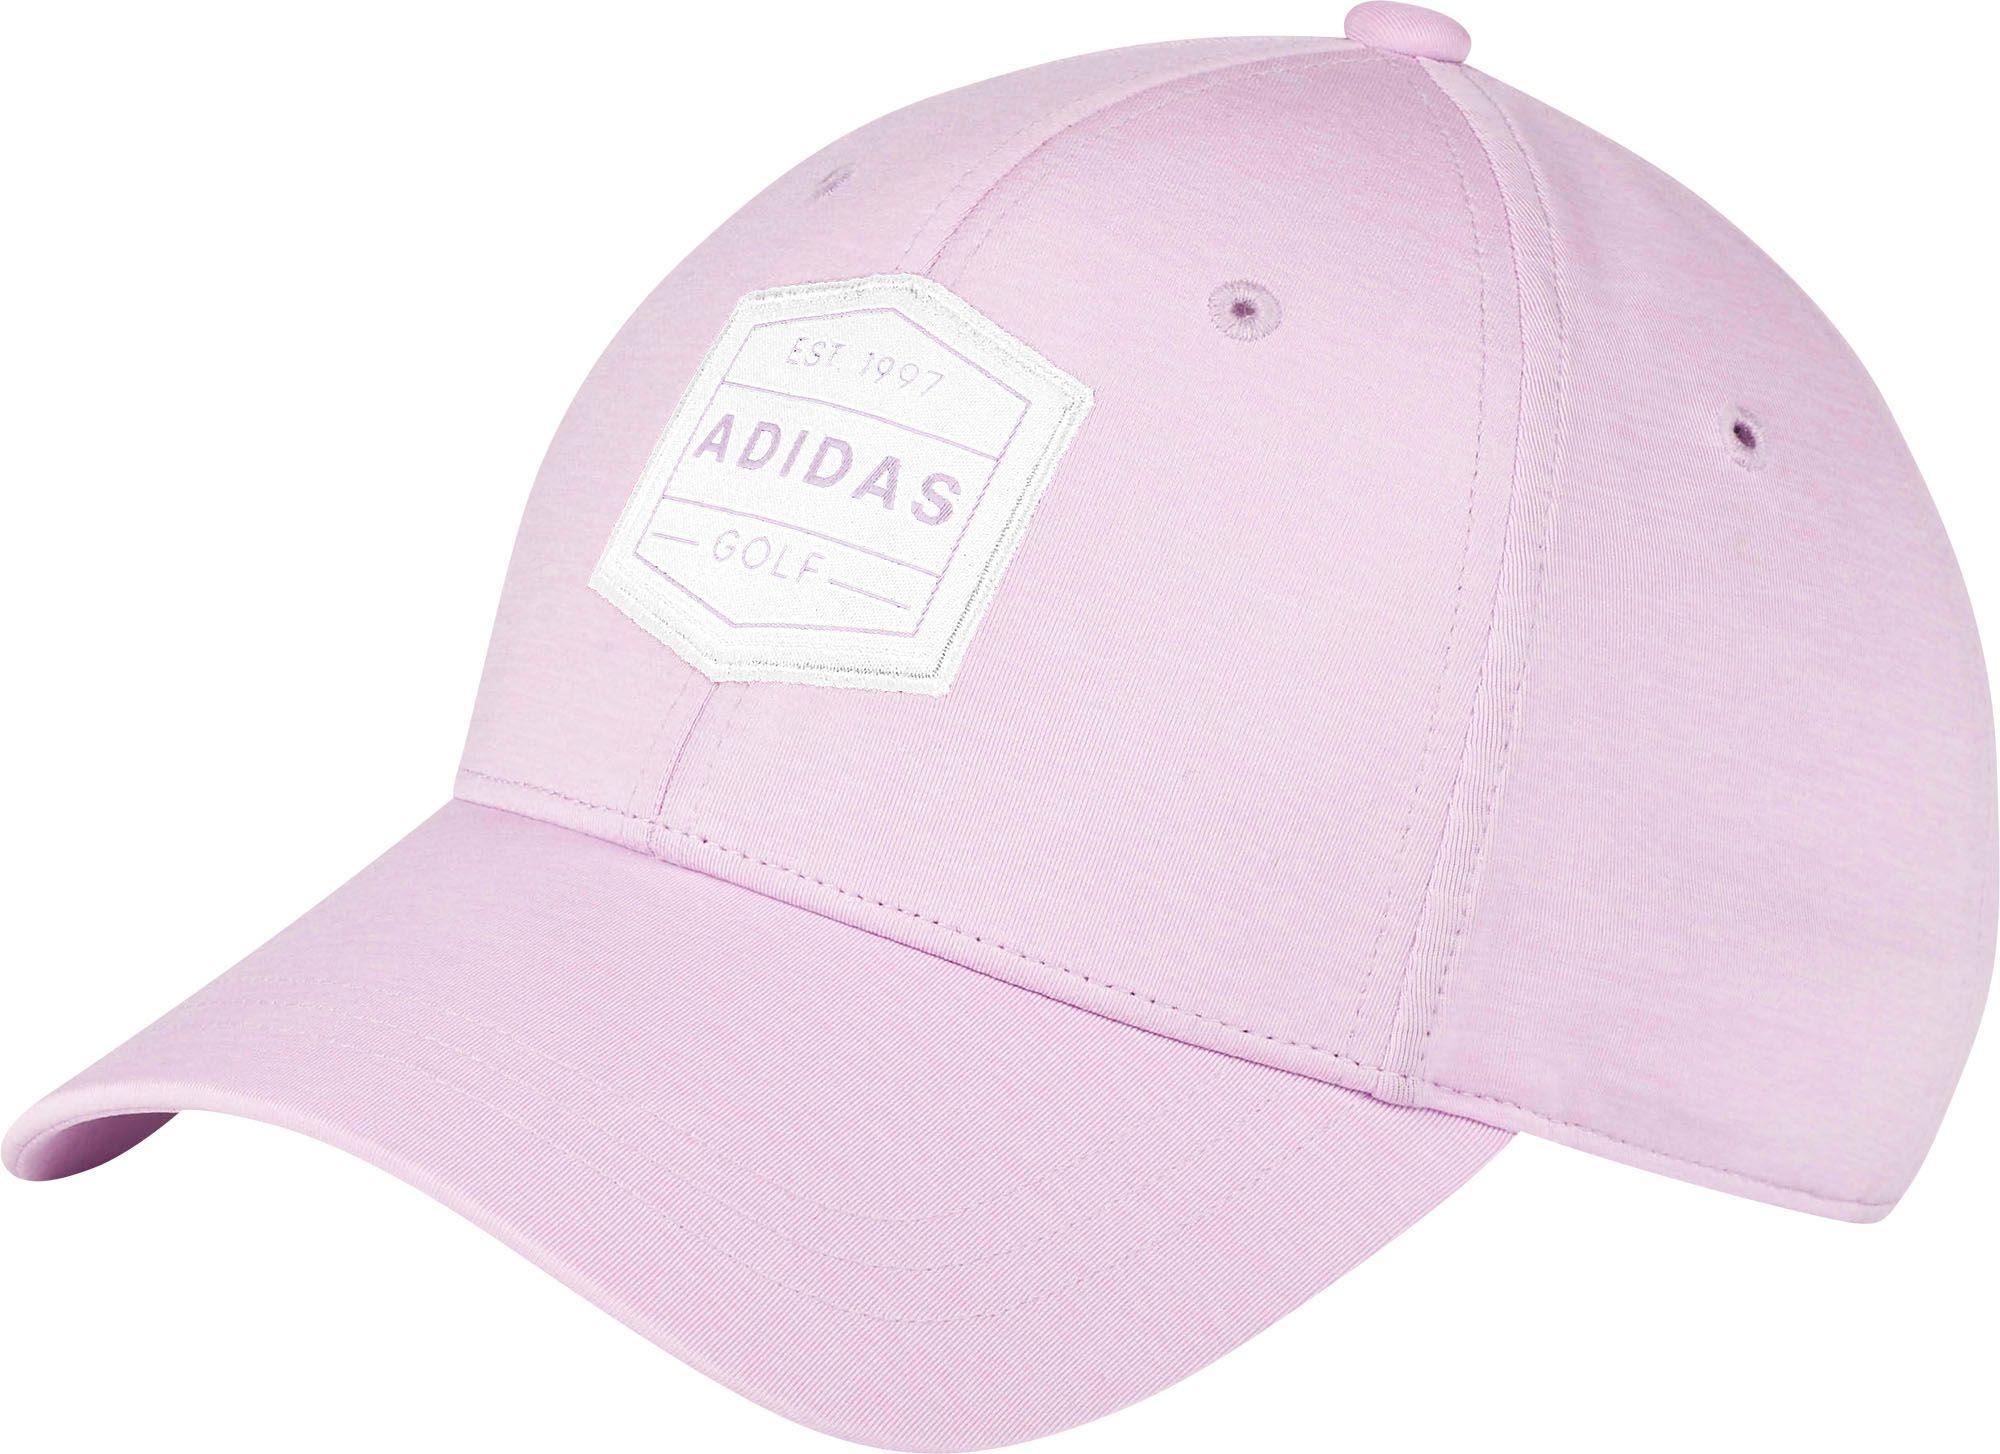 646215a56b2 Adidas - Multicolor Adge Golf Cap - Lyst. View fullscreen